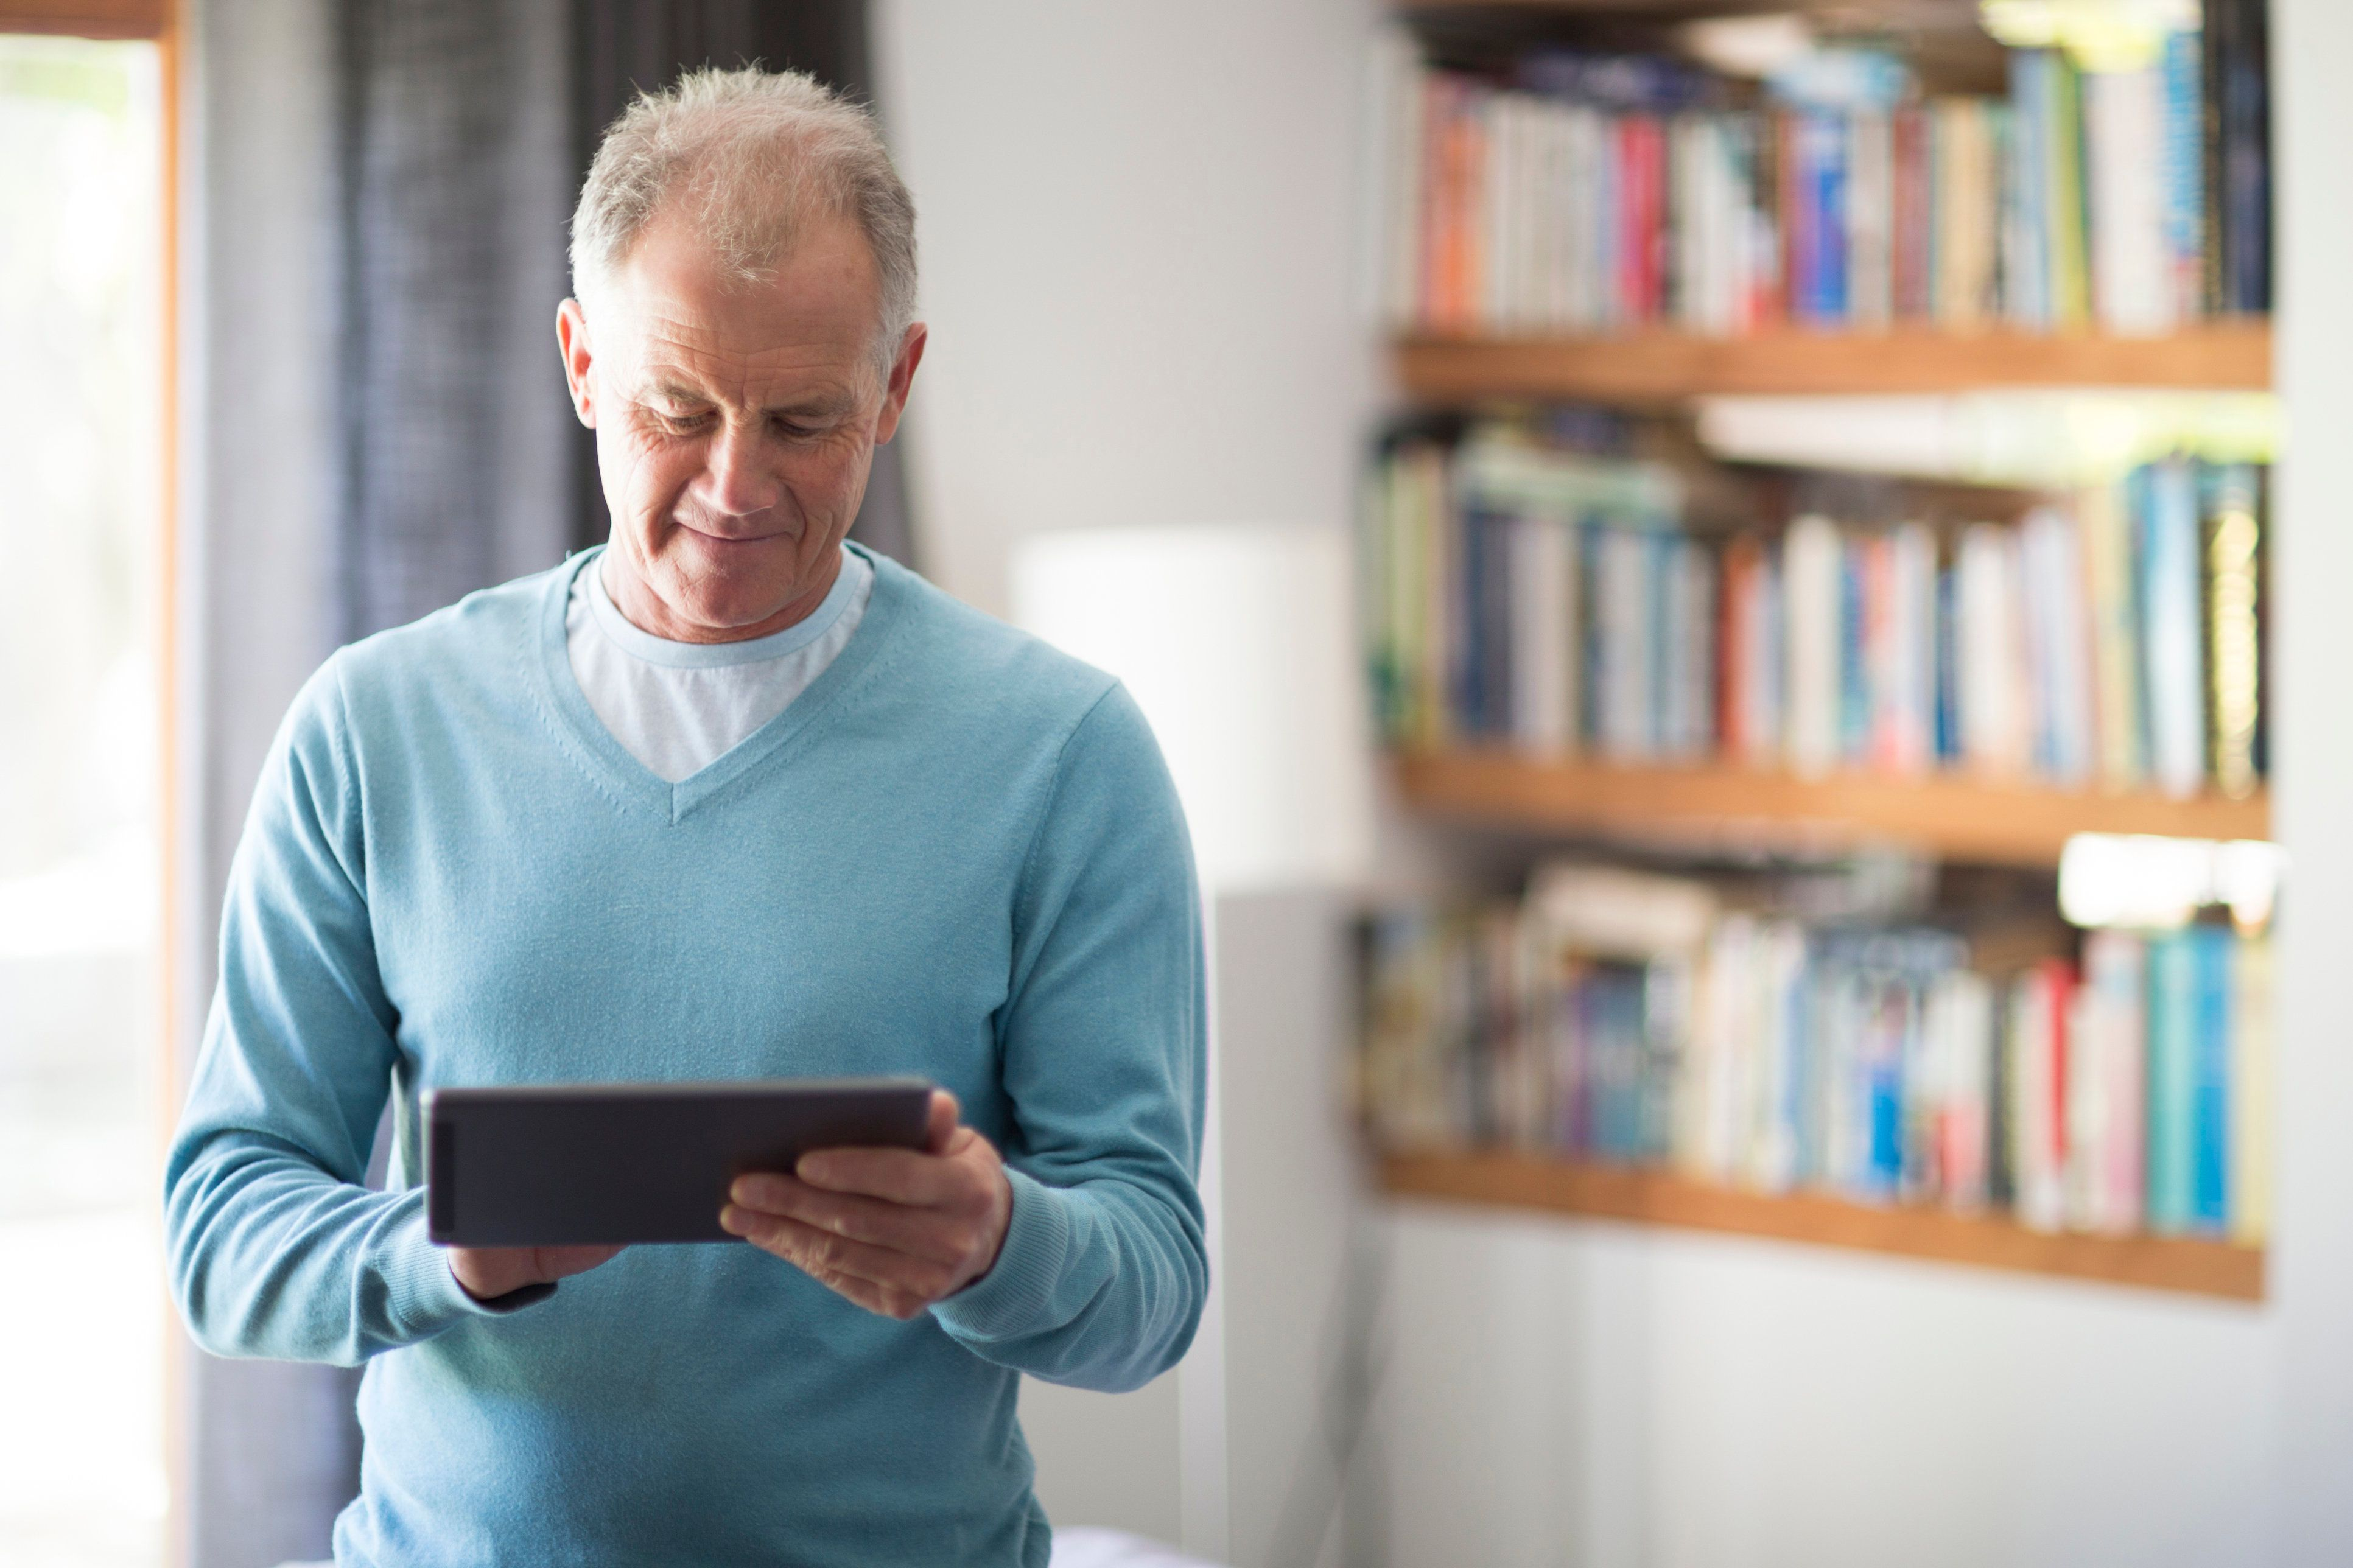 Senior man, aged 61,  using a tablet computer at home